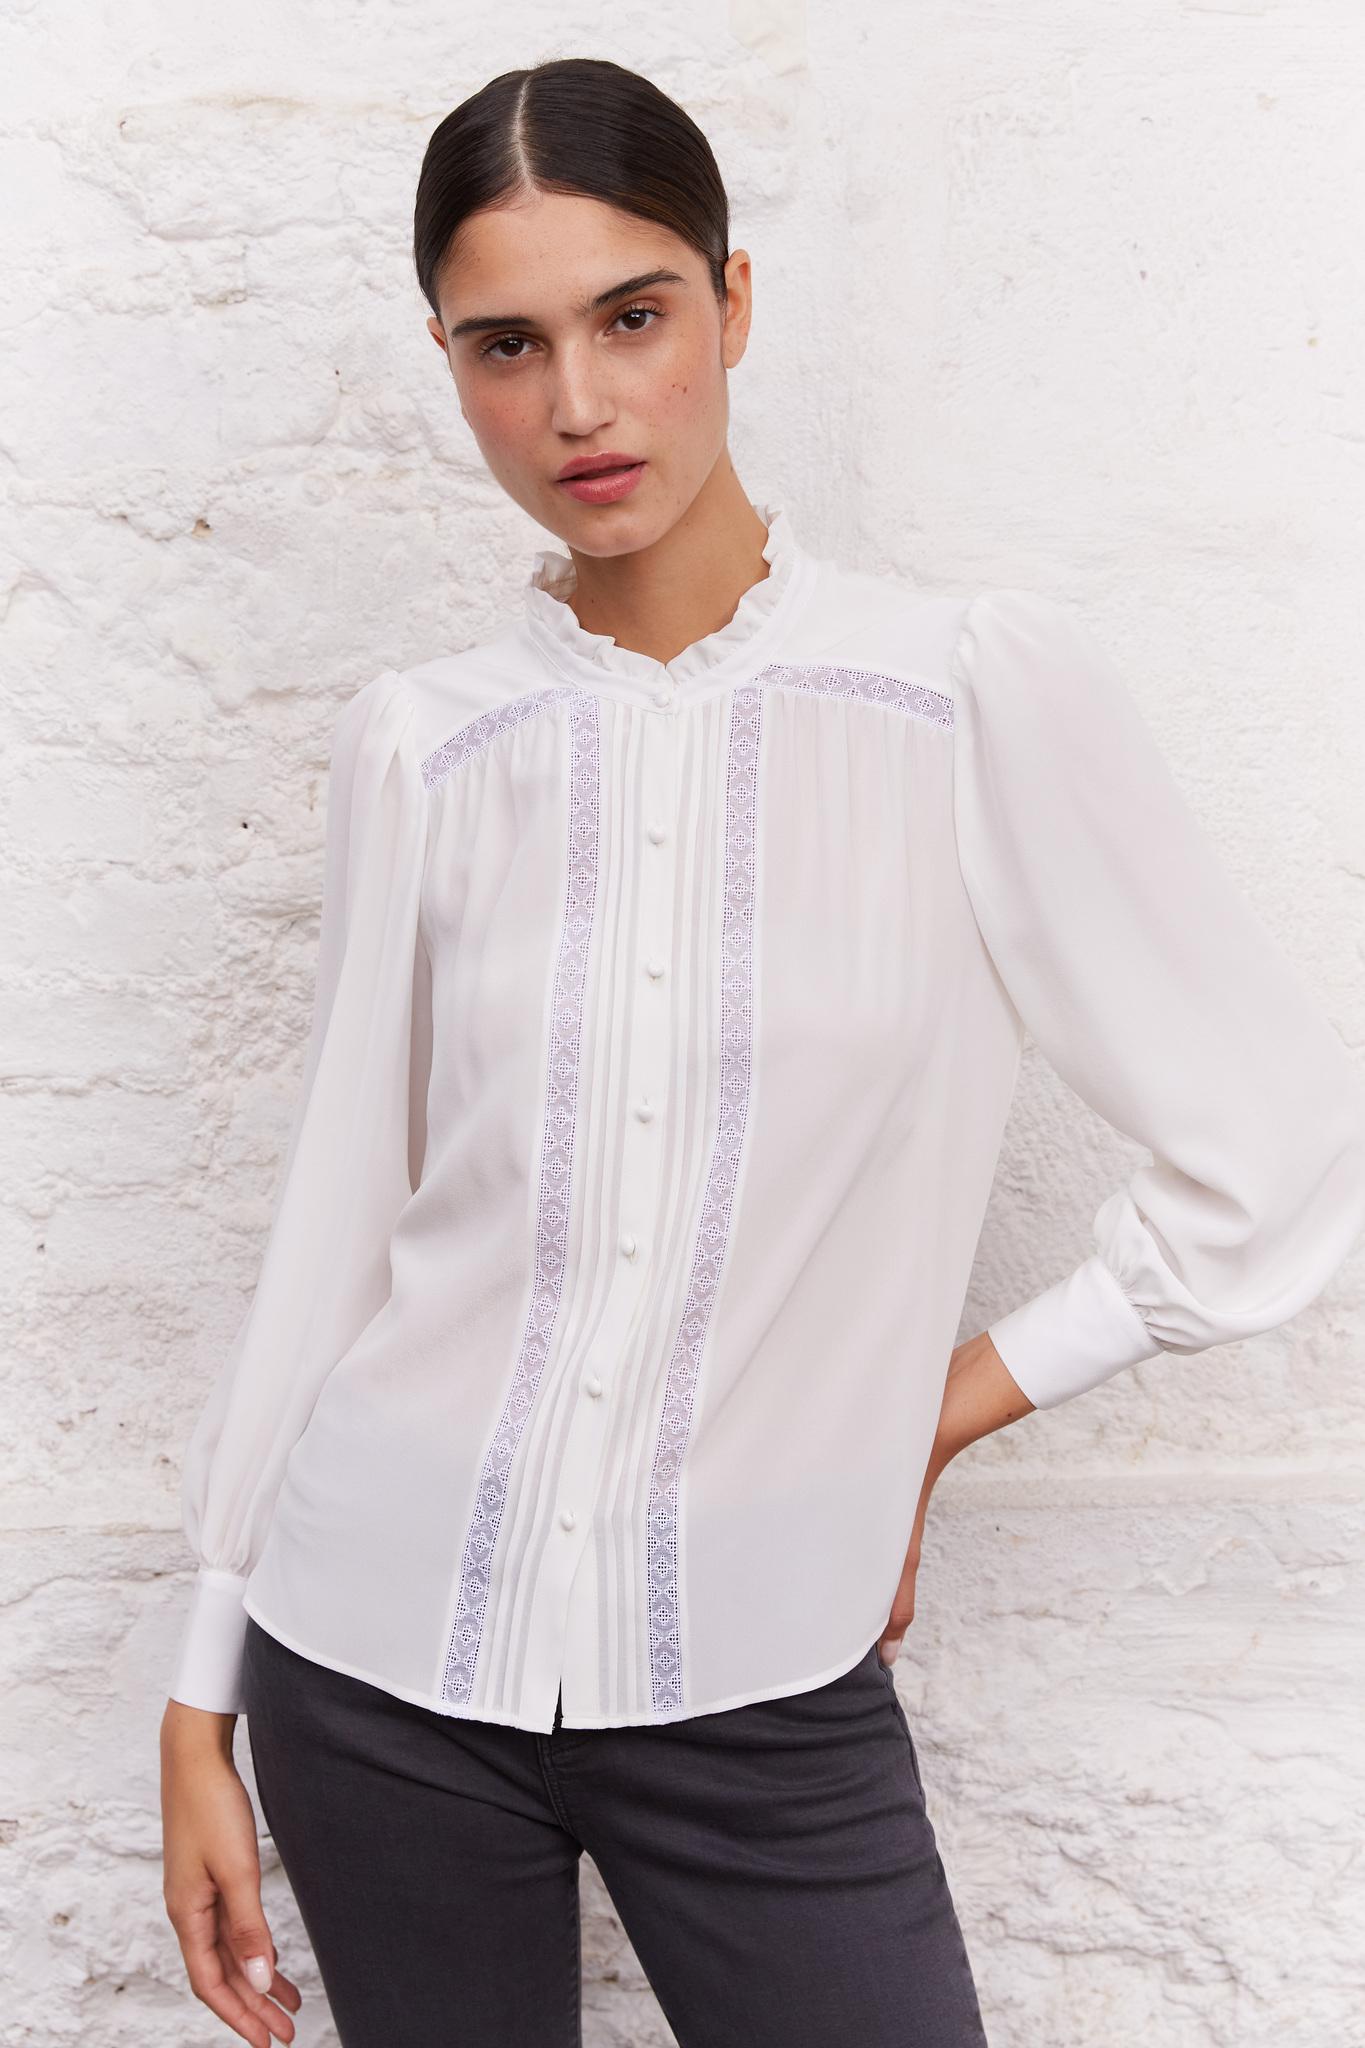 CESARIA - Шелковая блуза с вышивкой